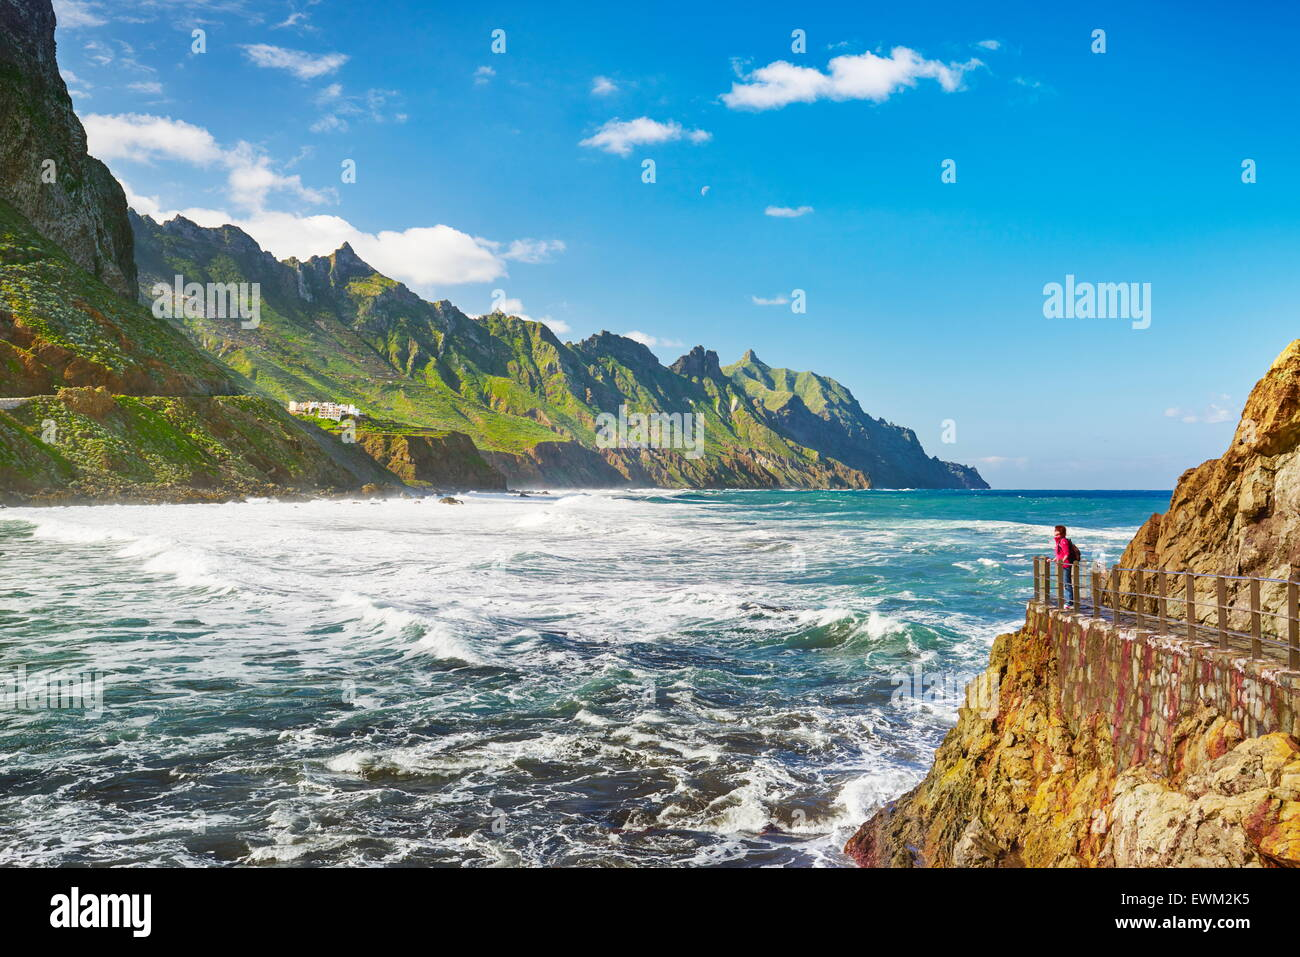 Almaciga, Taganana Coast, Tenerife, Canary Islands, Spain - Stock Image